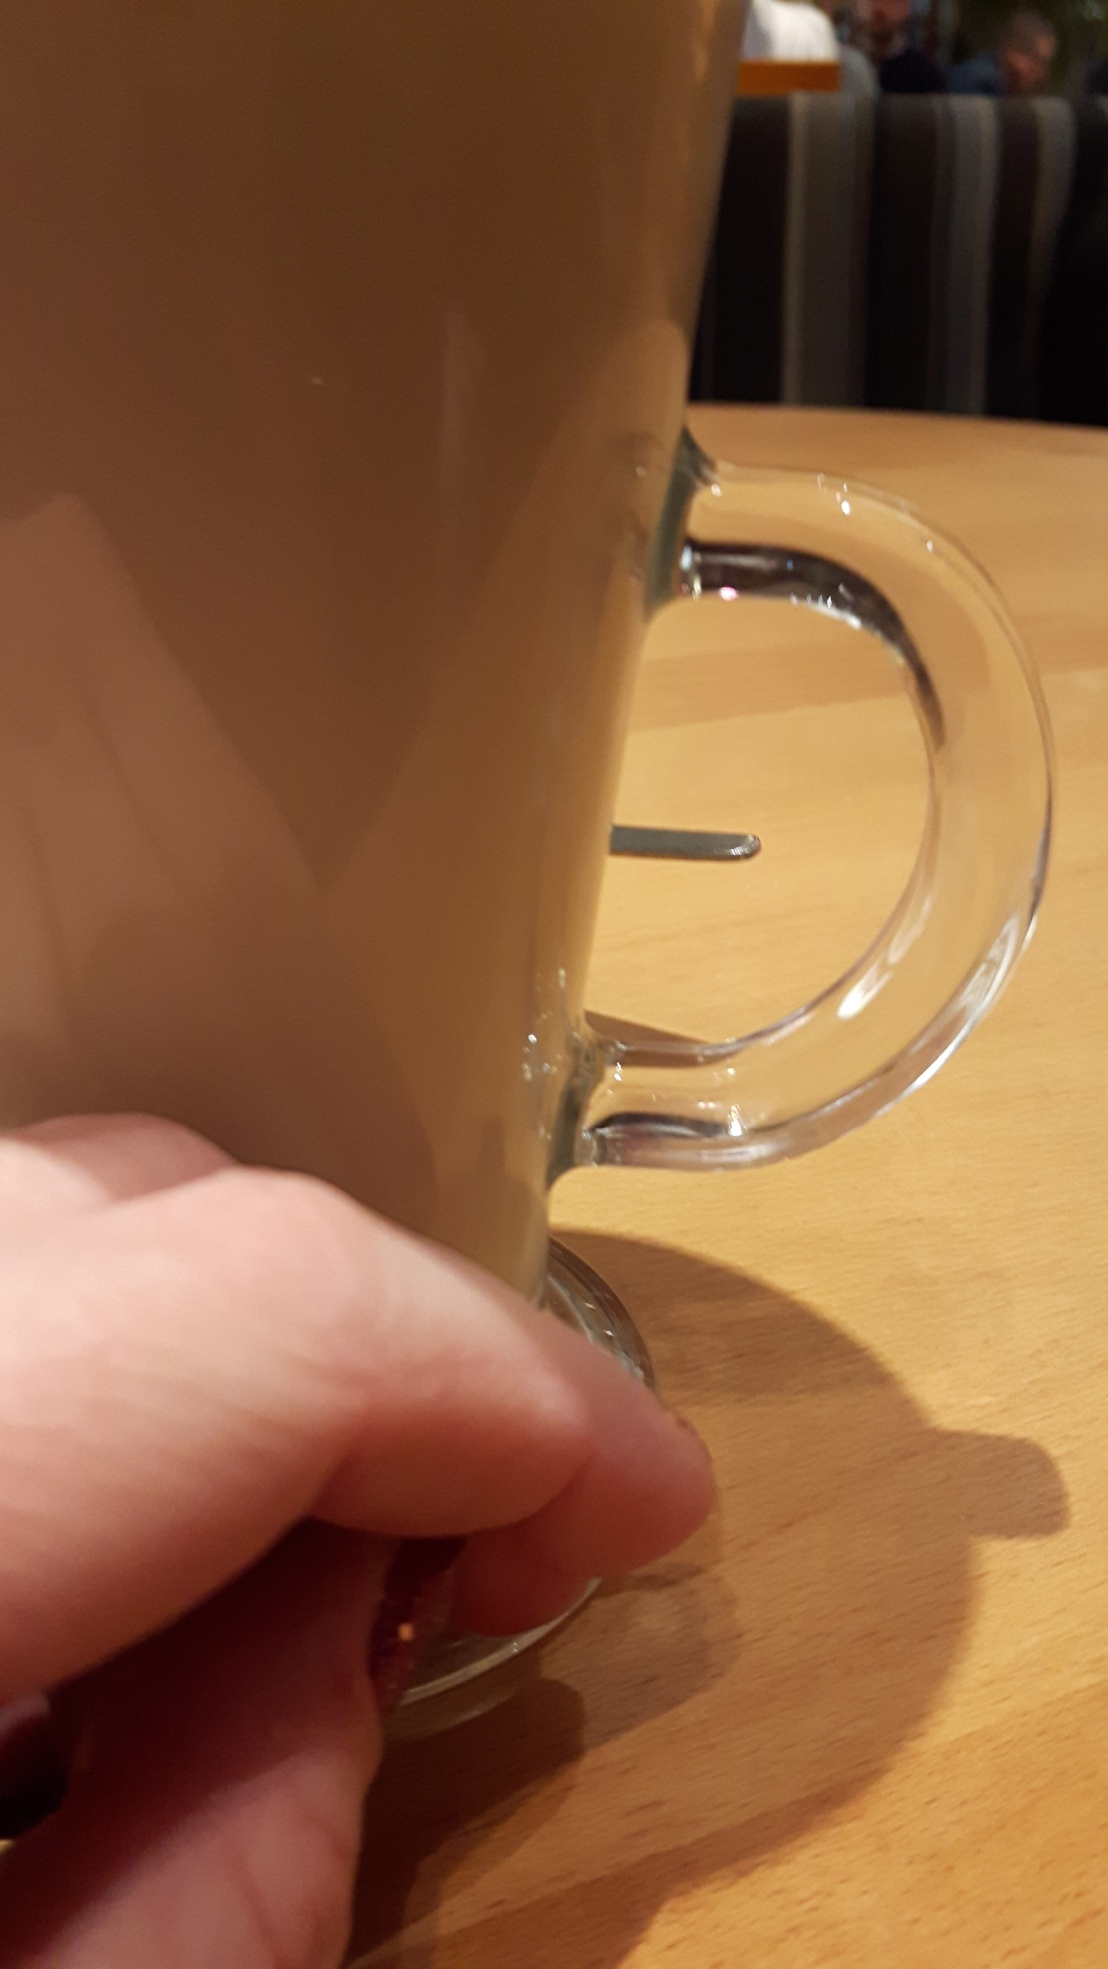 Stupid little things likecoffee